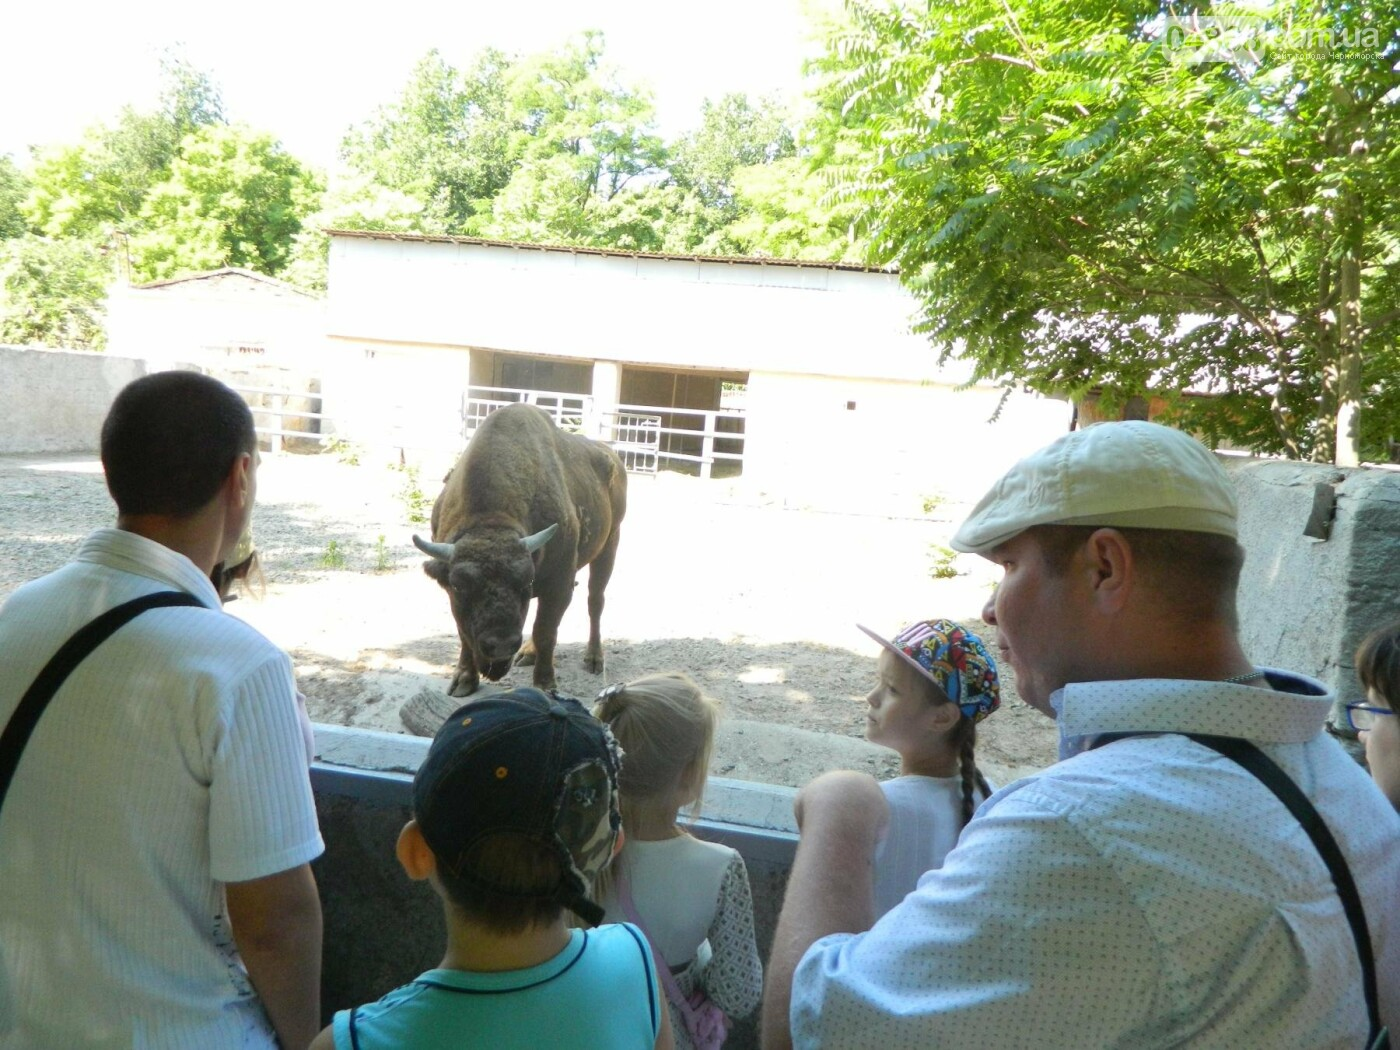 Дети из реабилитационного центра «Радуга» посетили зоопарк, фото-3